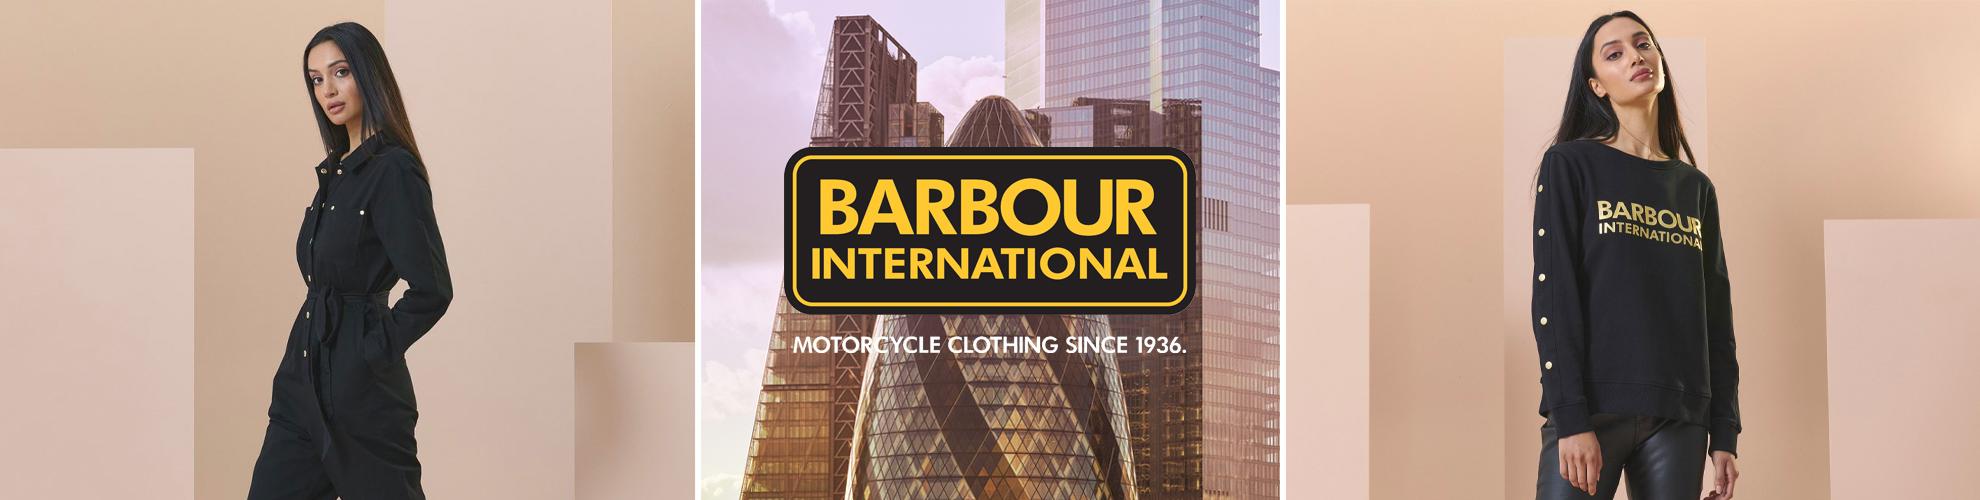 Barbour International Moto Originals